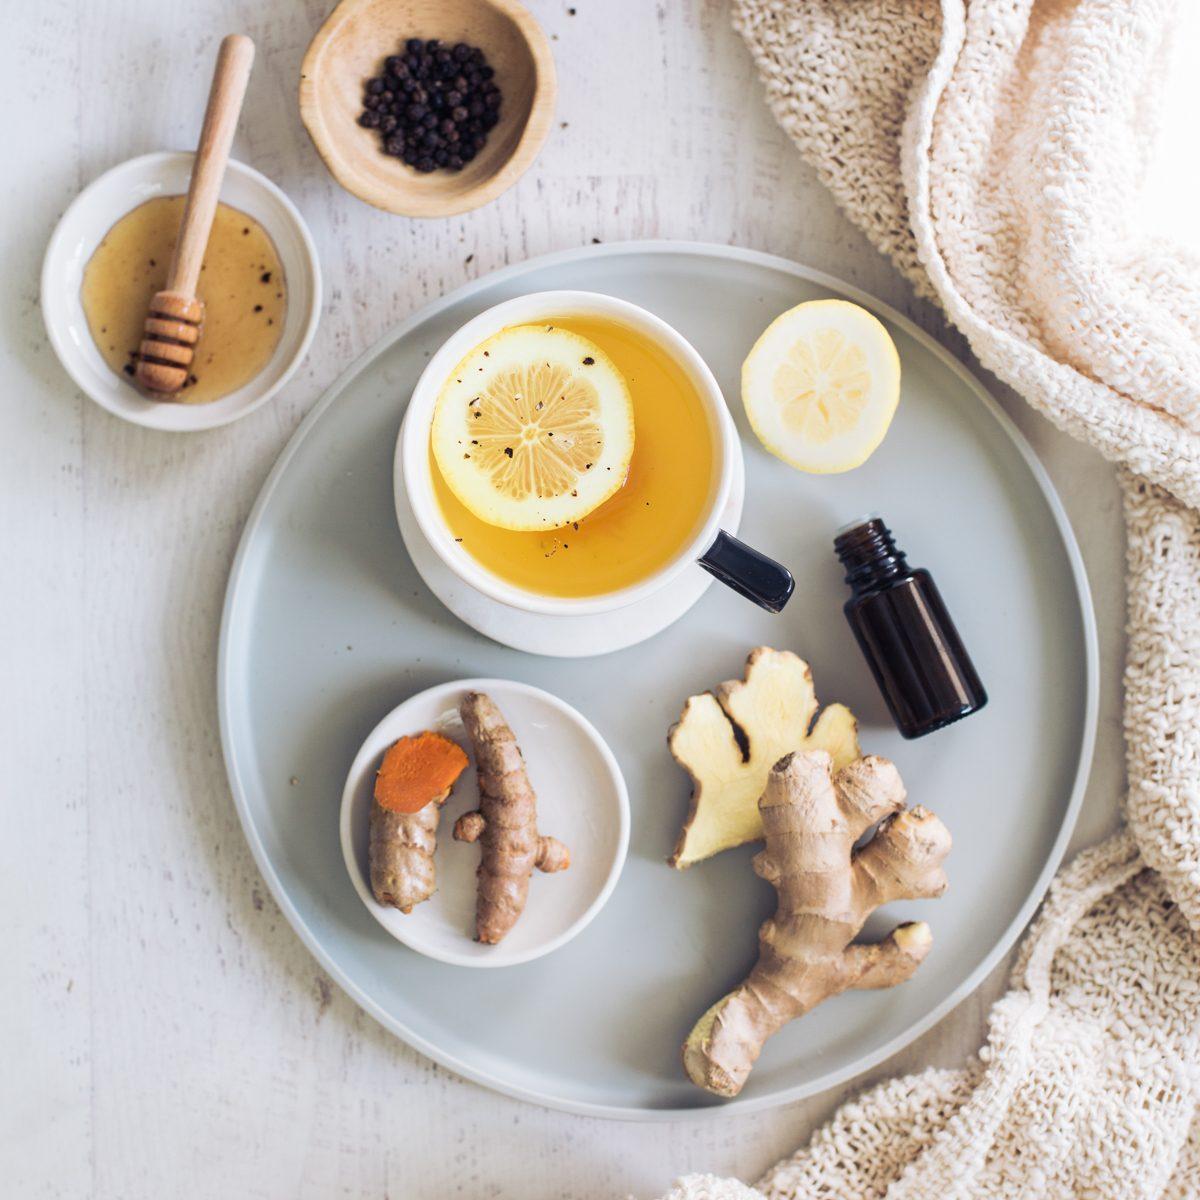 immune boosting tips